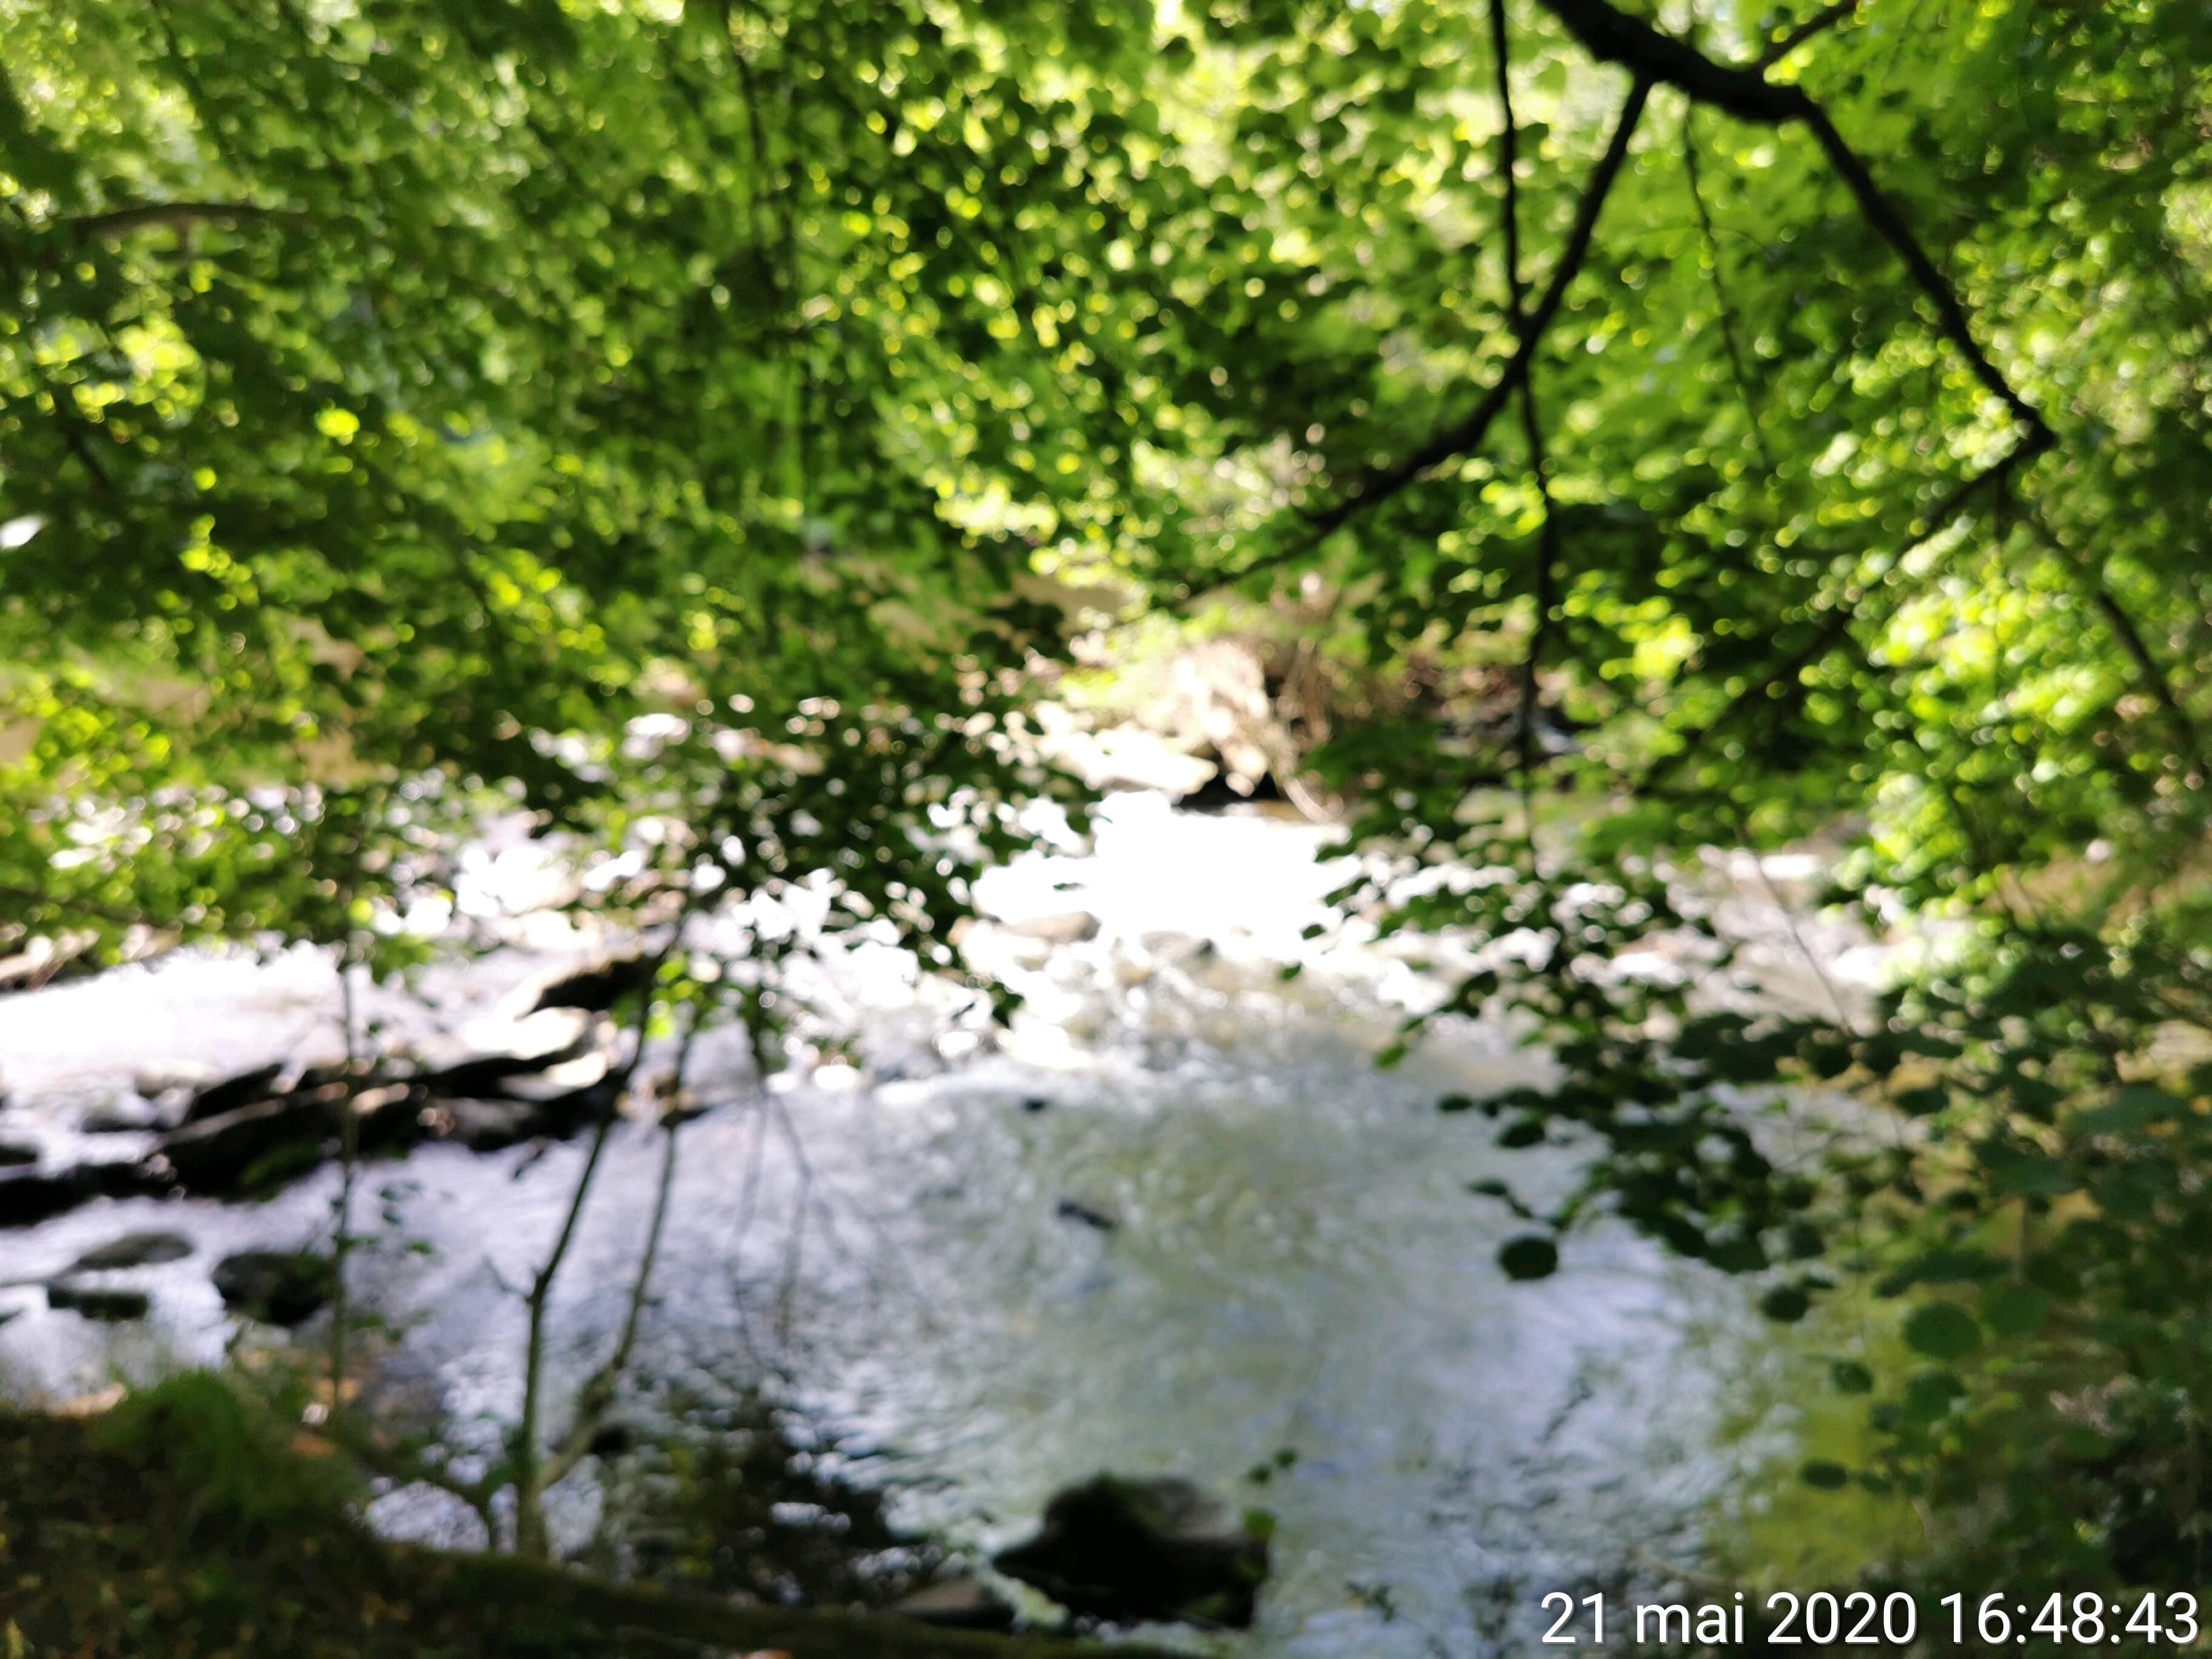 TimePhoto_20200521_164843.jpg